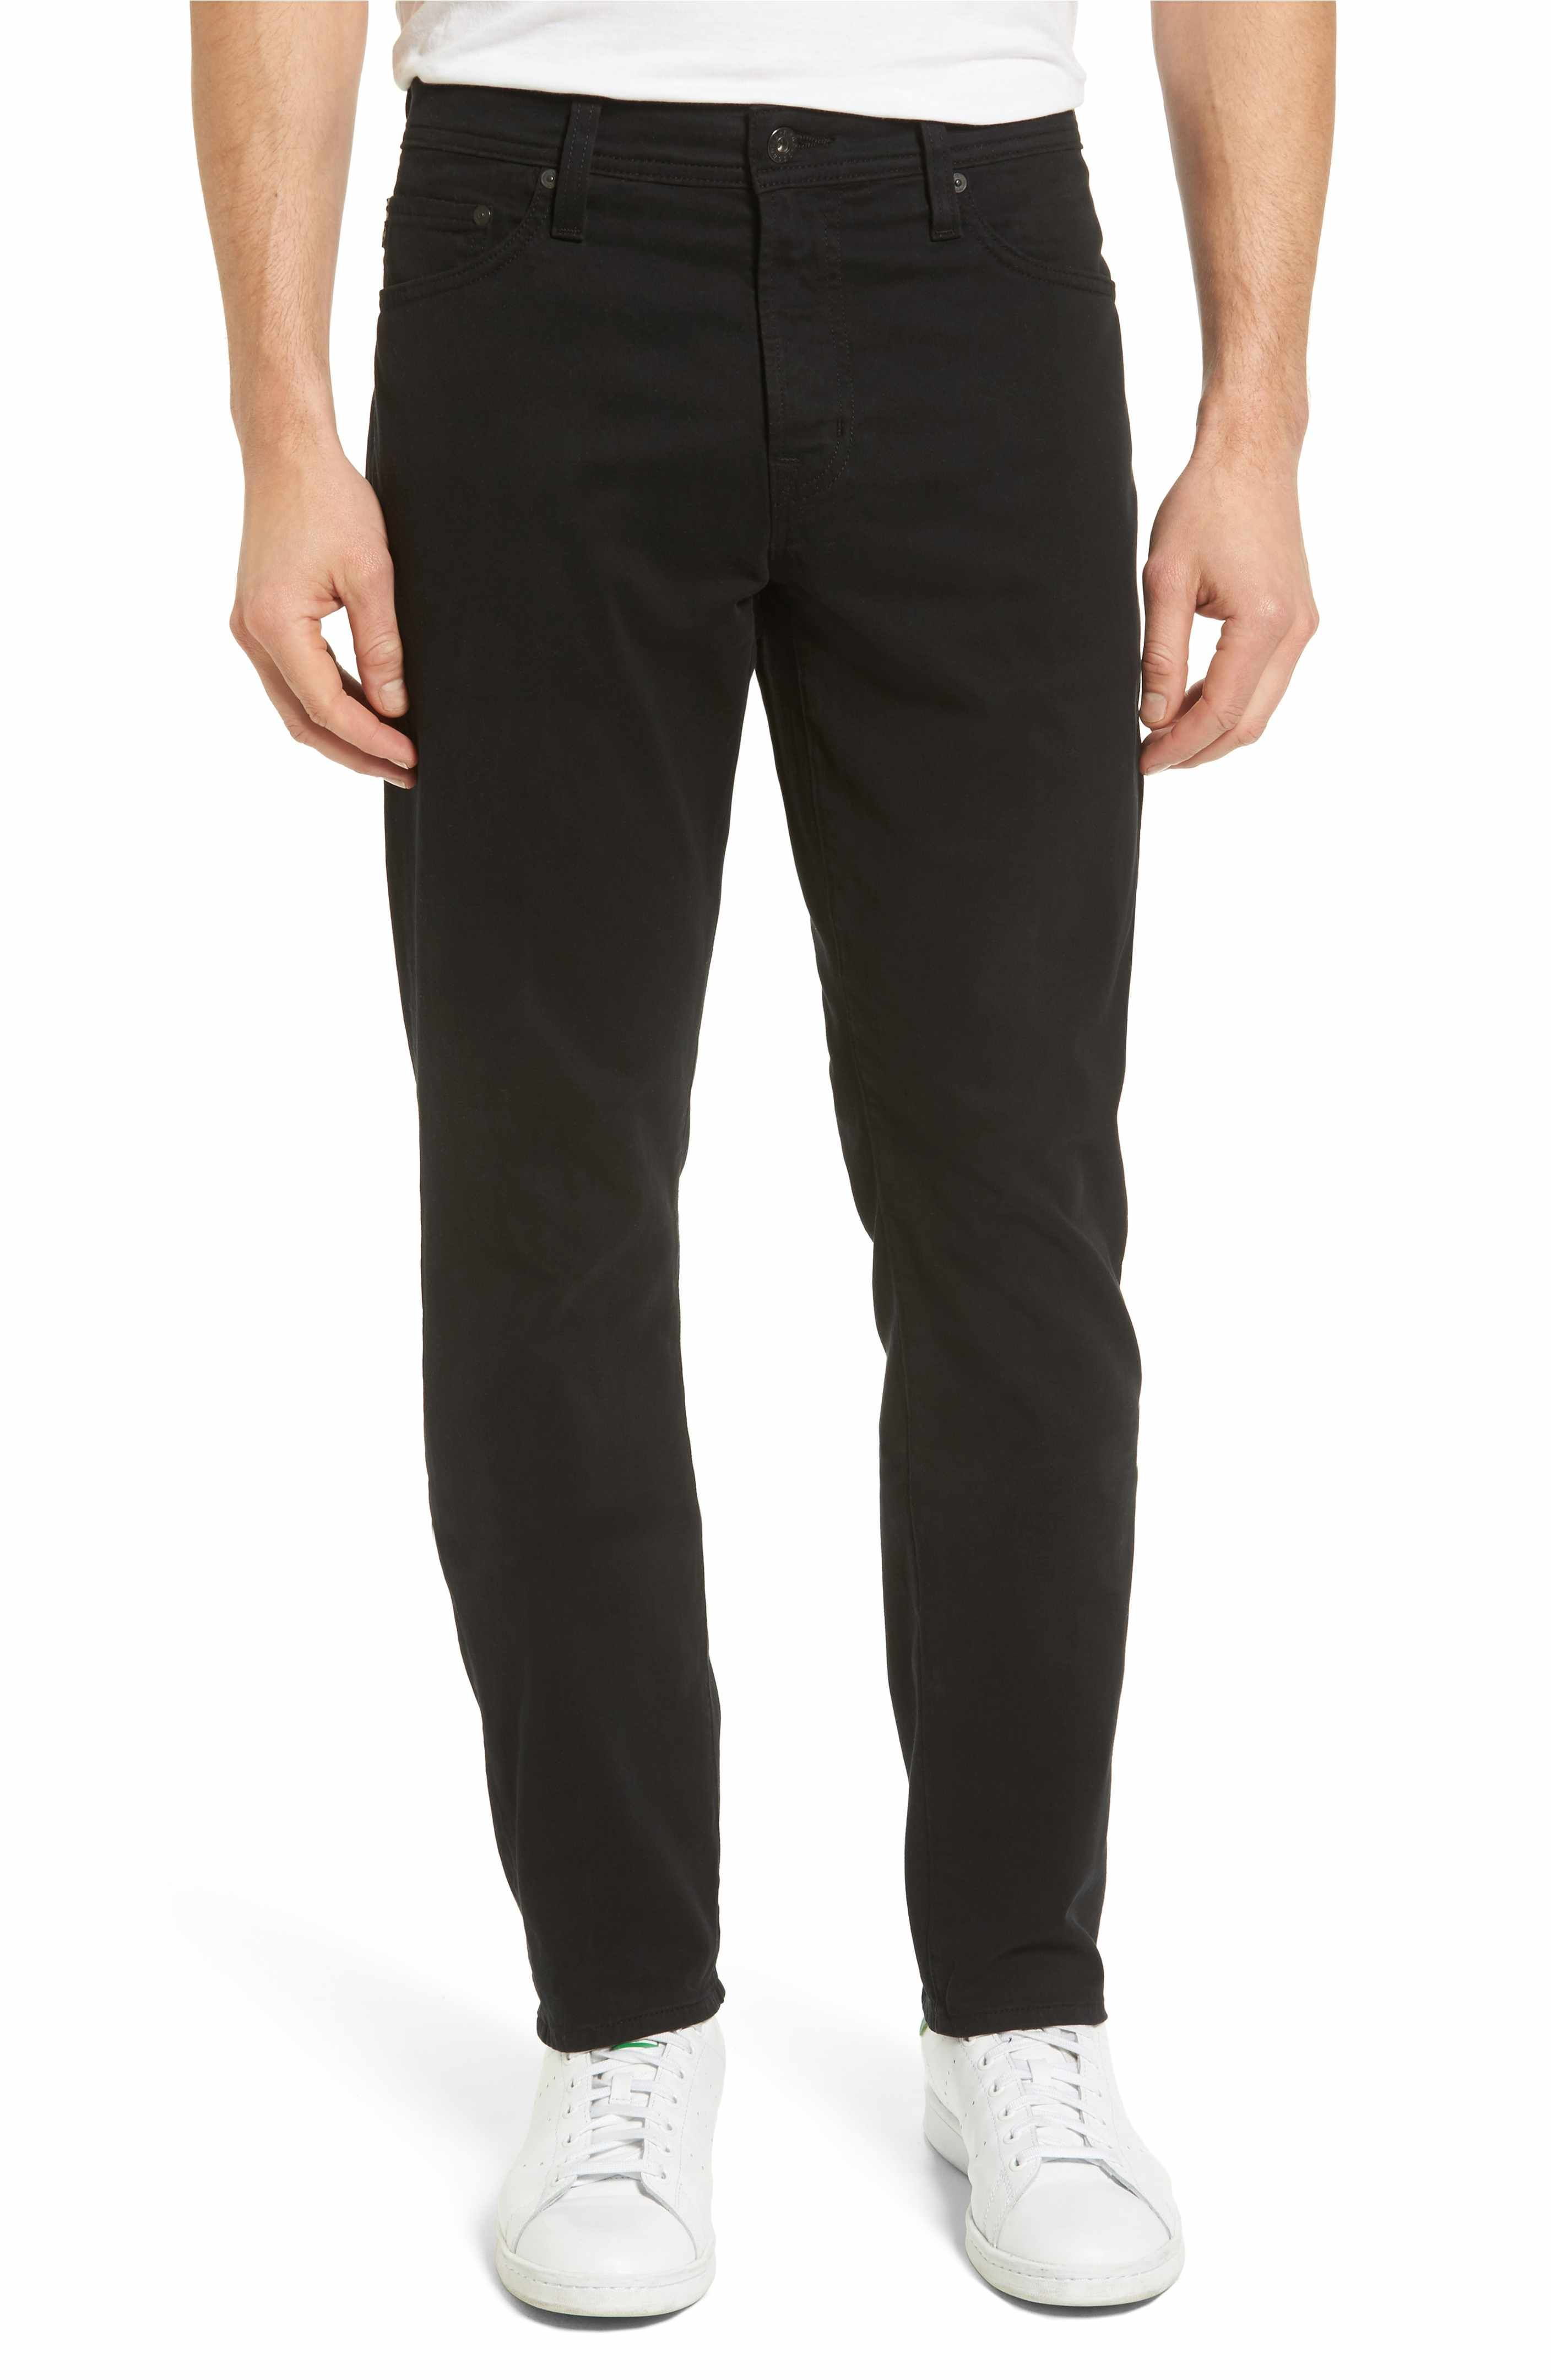 9db89618fb Slim Fit Dress Pants For Big Thighs - Data Dynamic AG